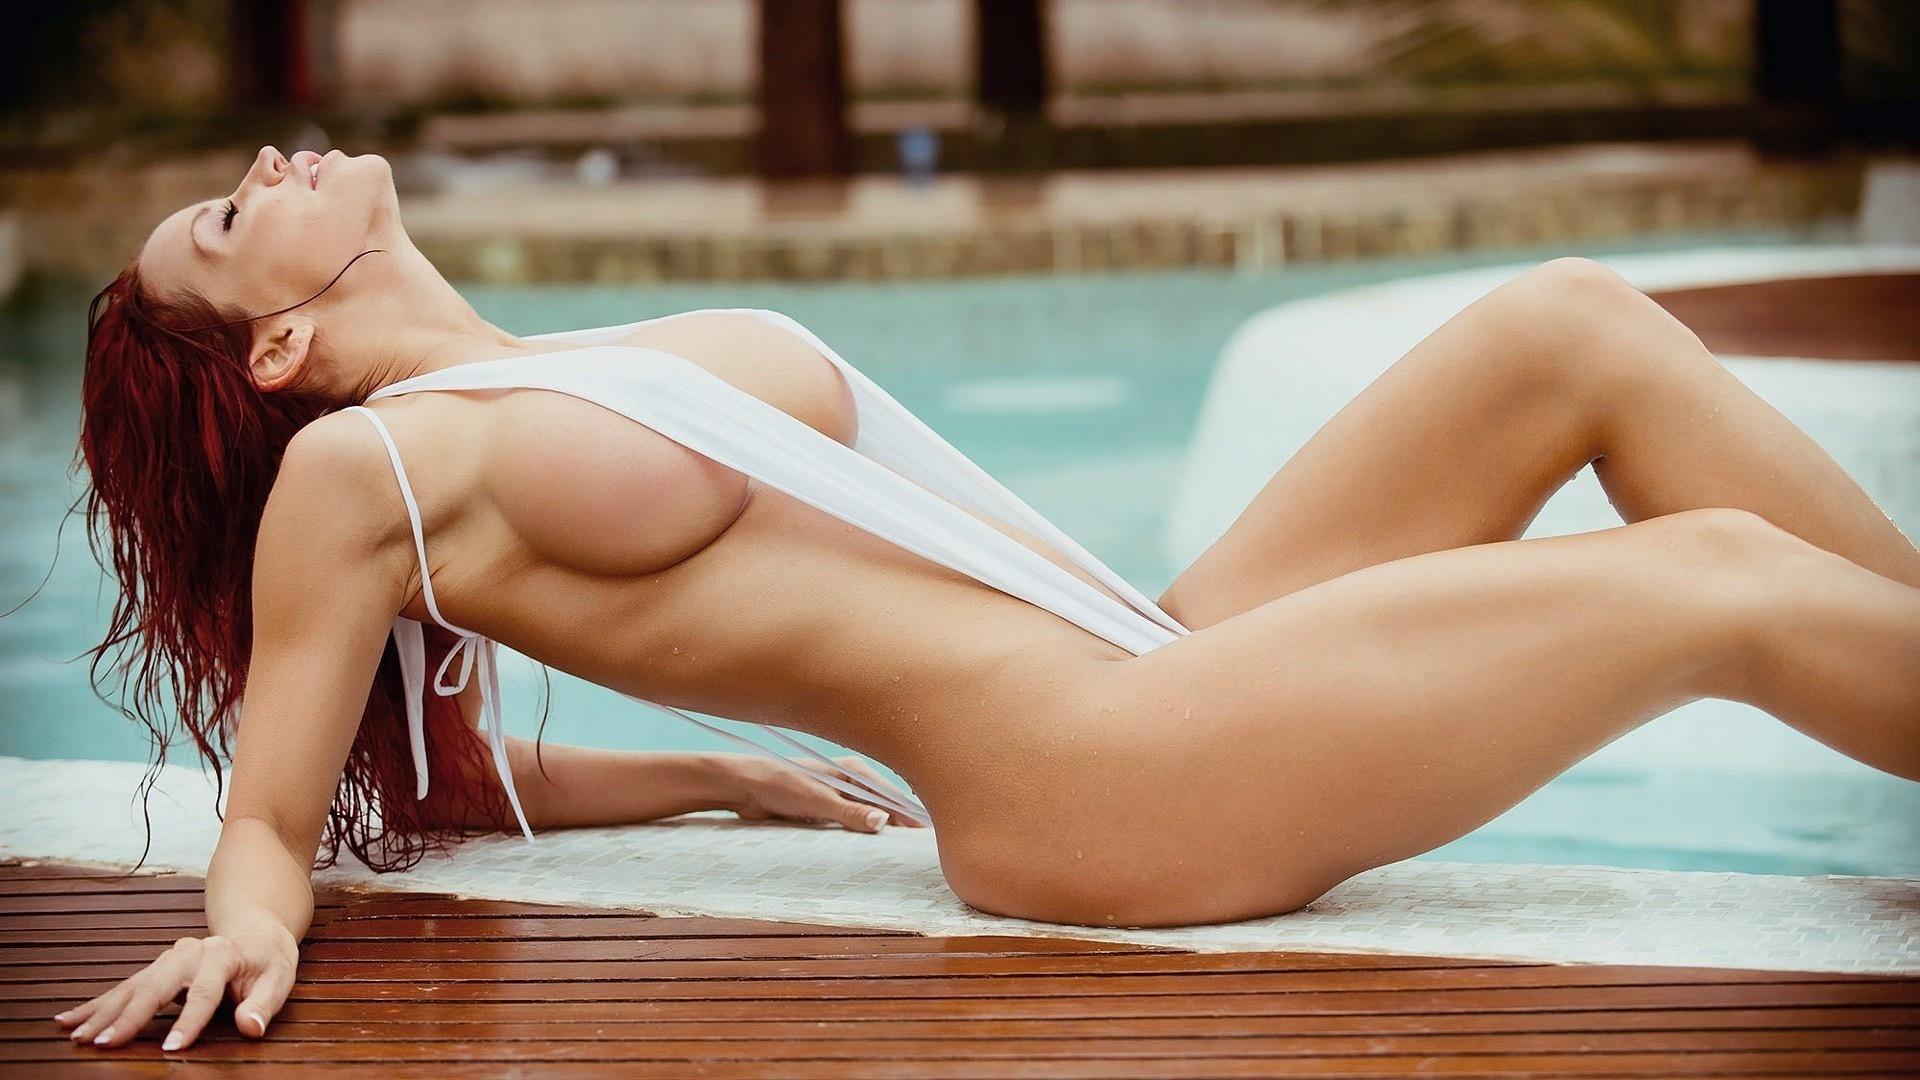 sisyastimi-devkami-ero-bikini-oboi-starih-pizd